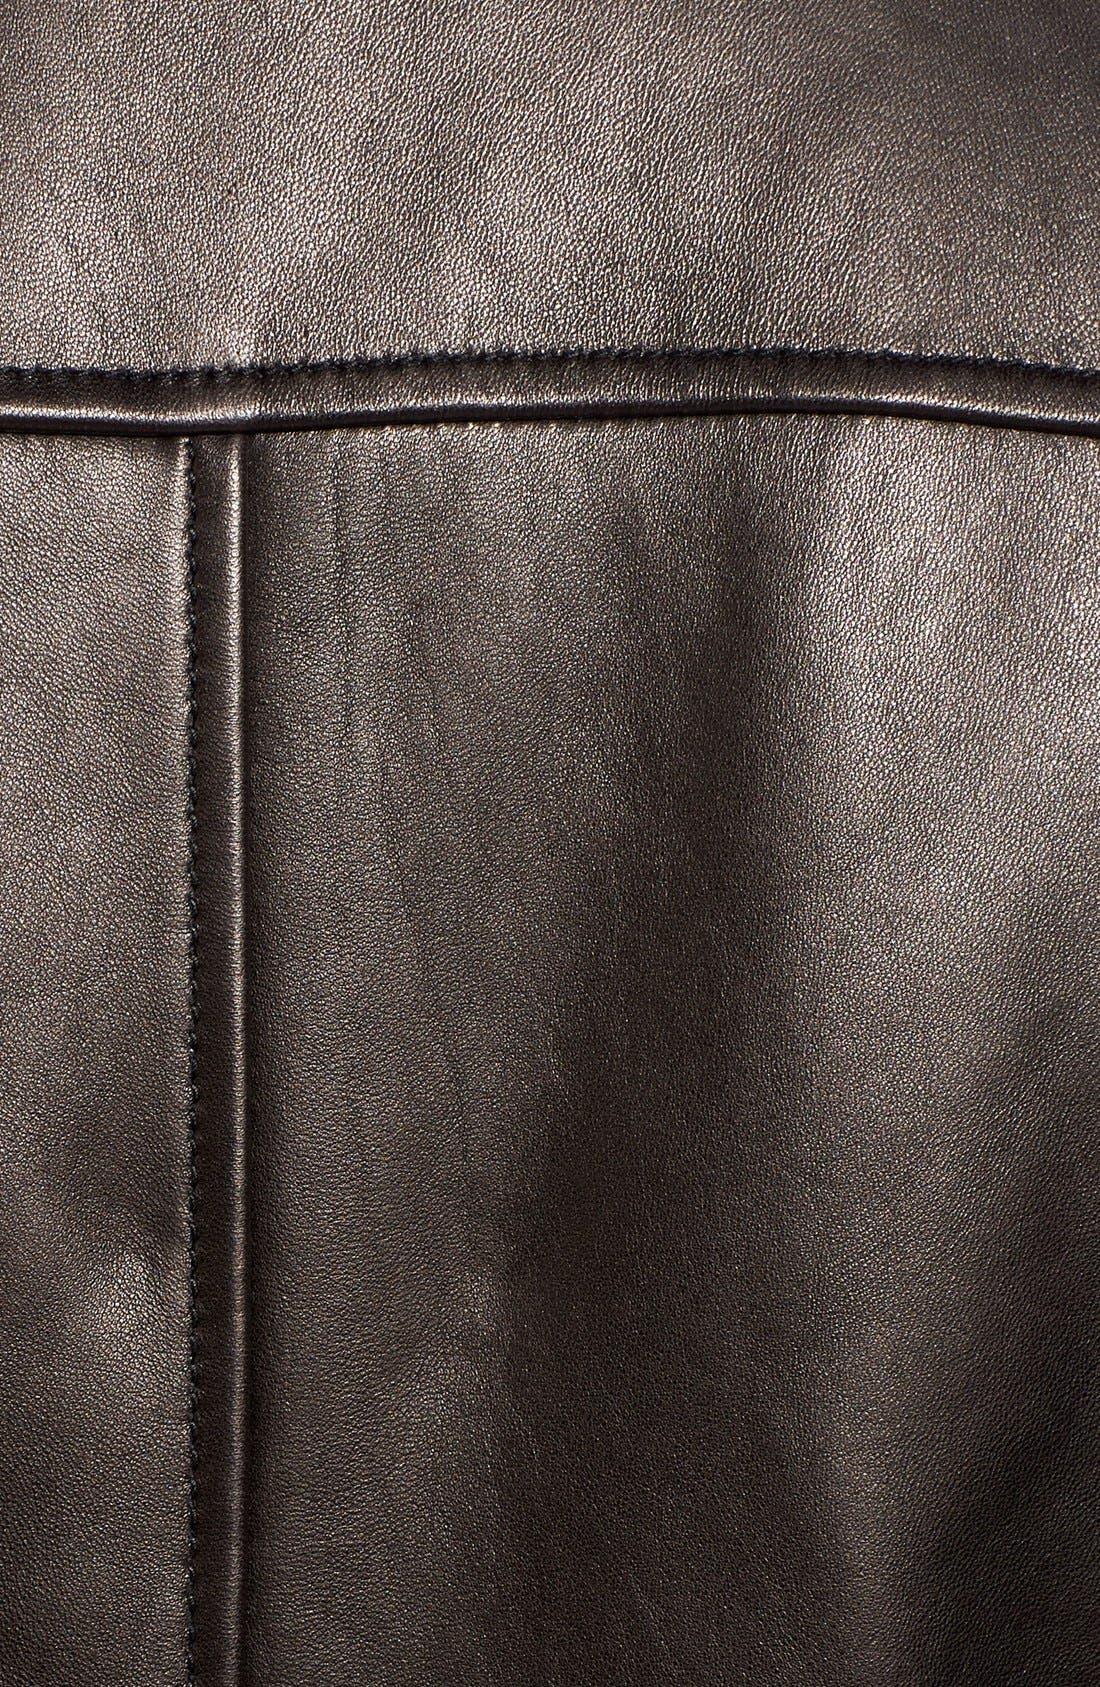 Lambskin Leather Moto Jacket,                             Alternate thumbnail 4, color,                             001